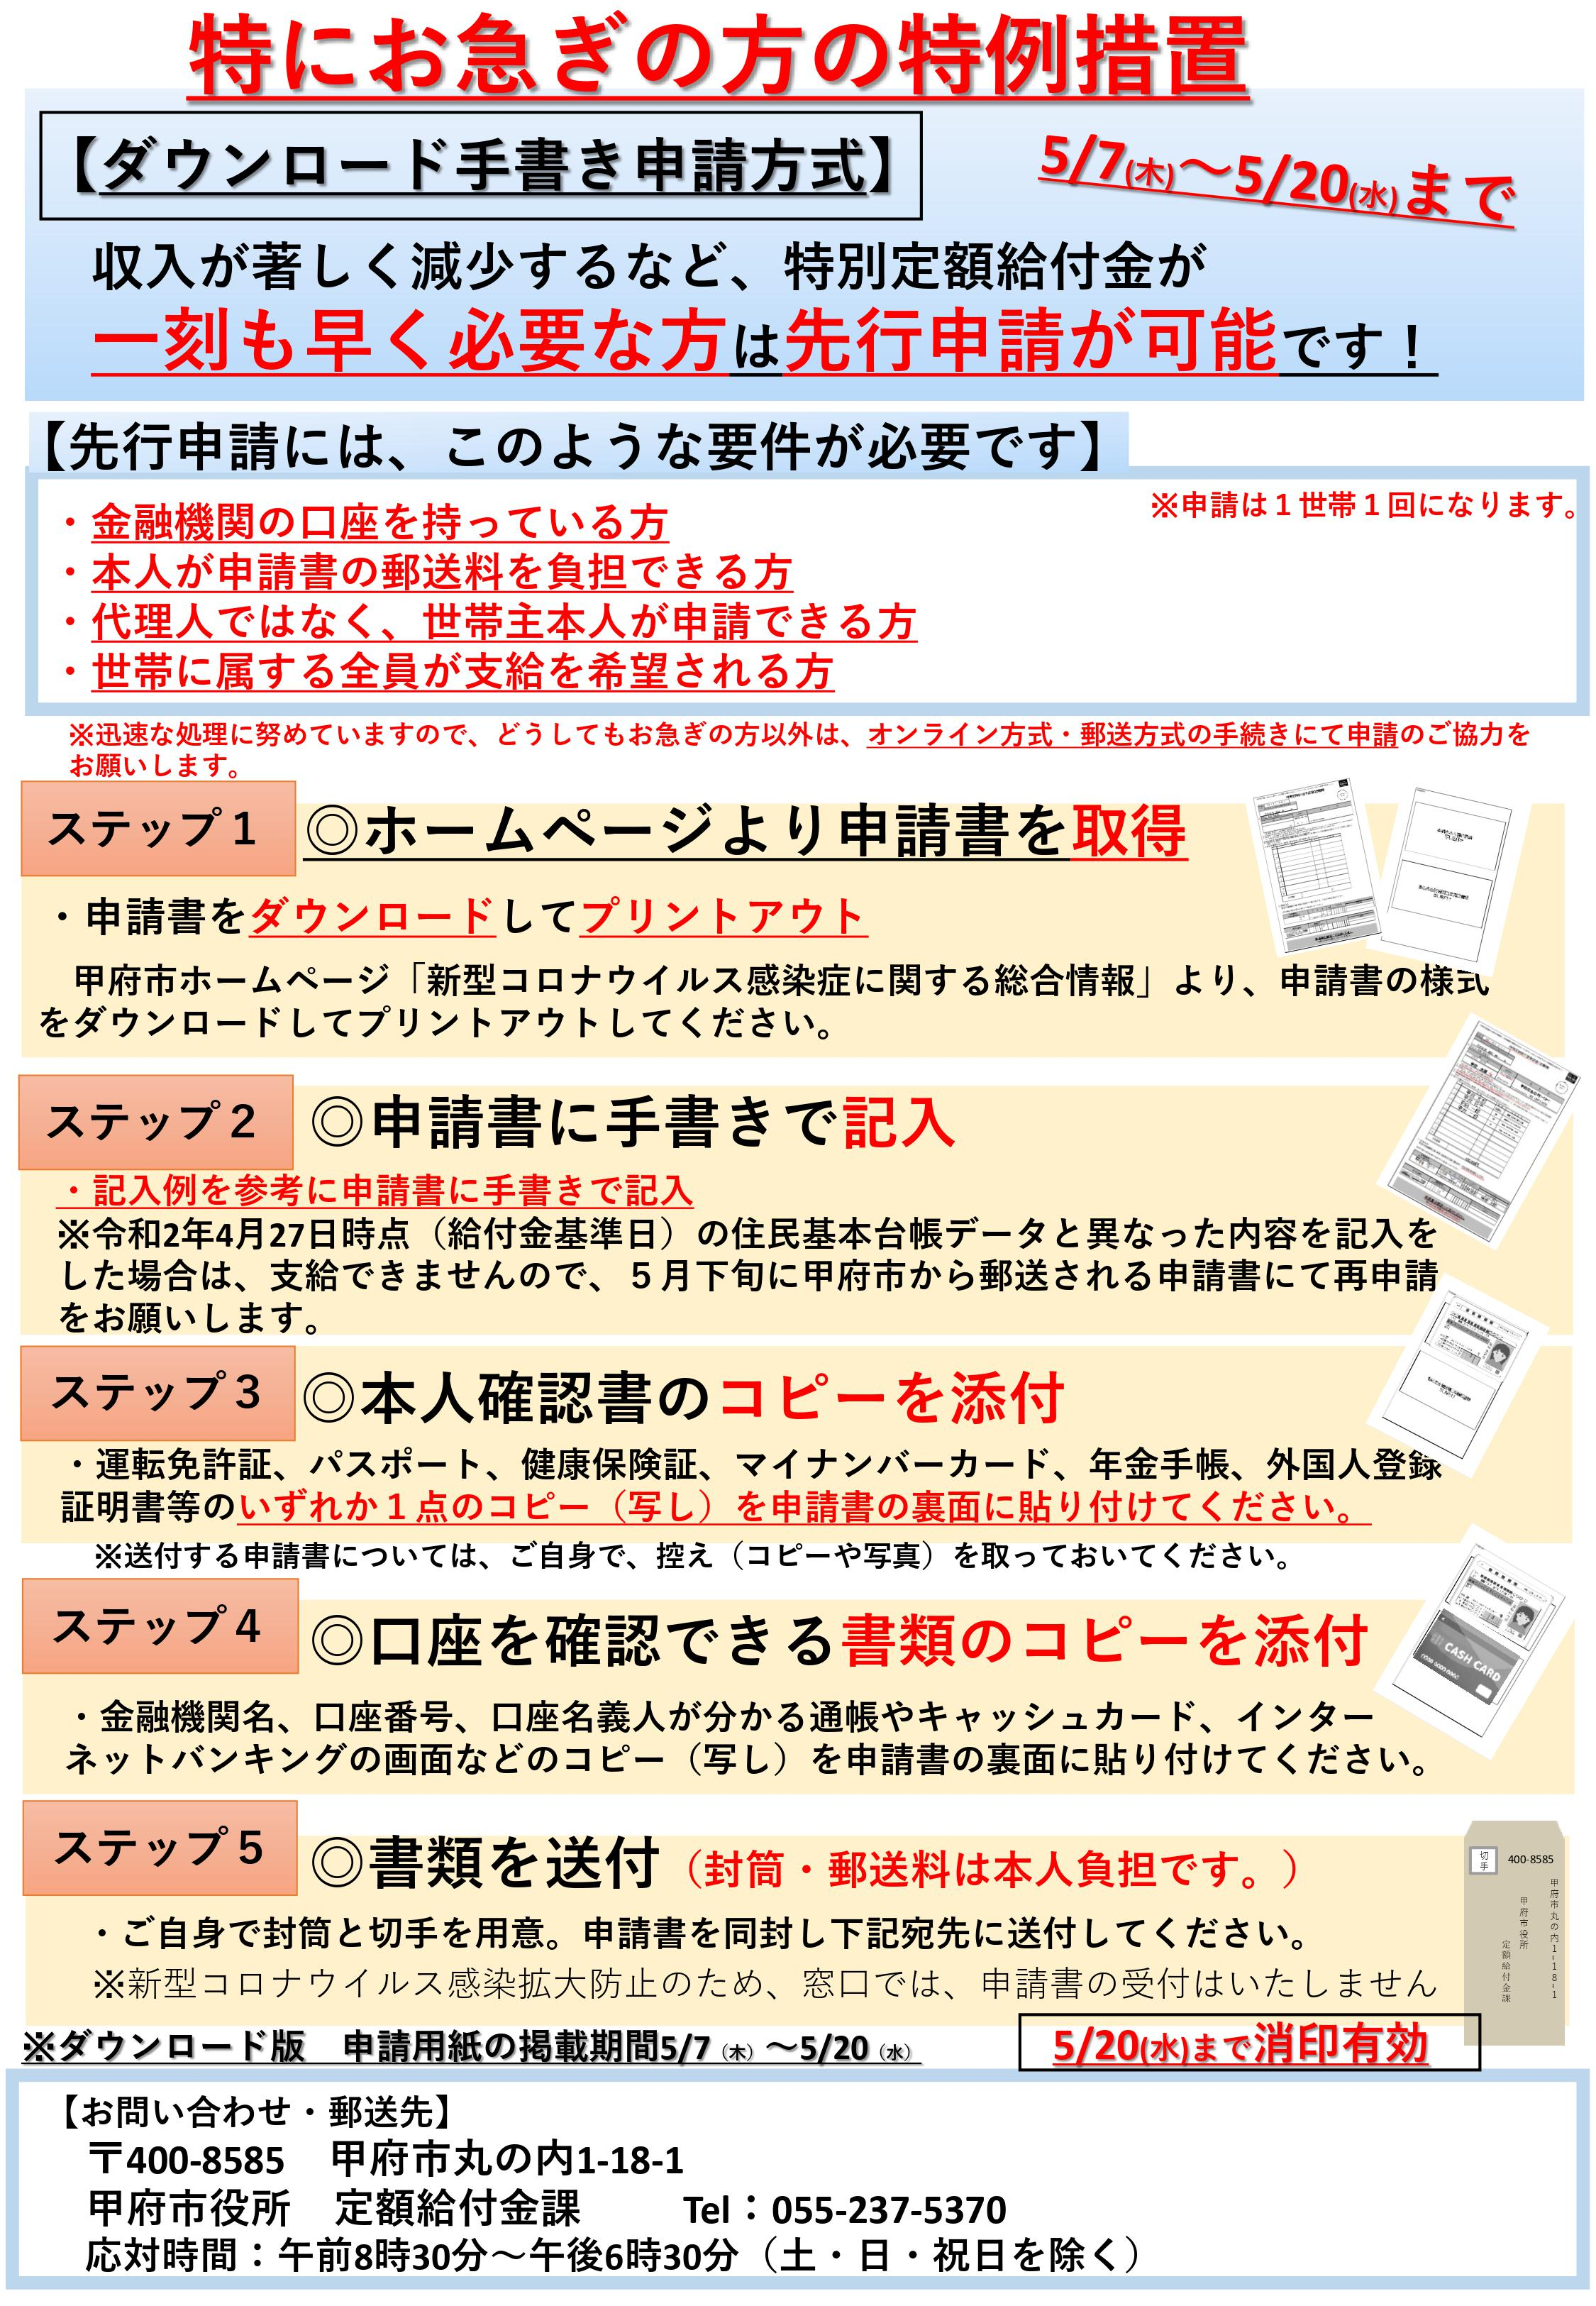 コピー 給付 金 <現金10万円給付!>特別定額給付金の申請方法~受給までを解説